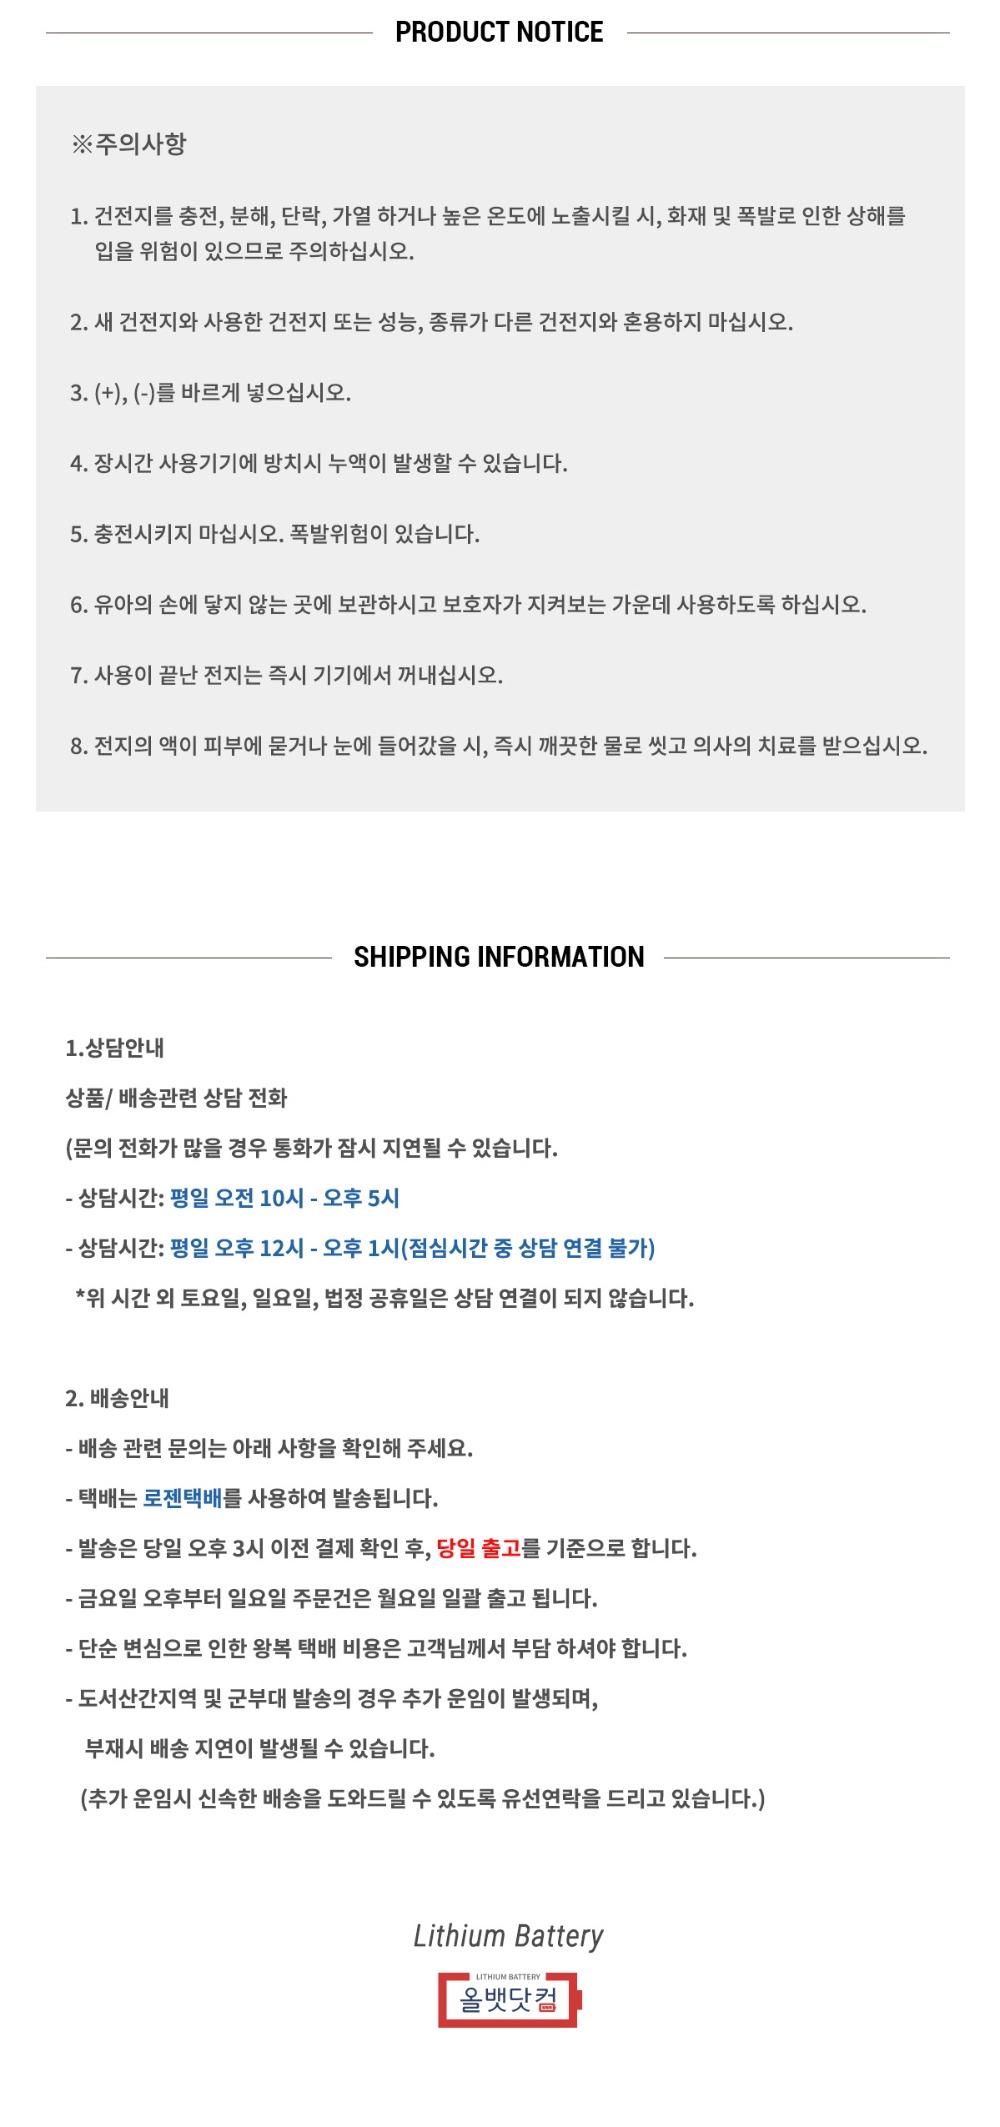 Product Notice.jpg